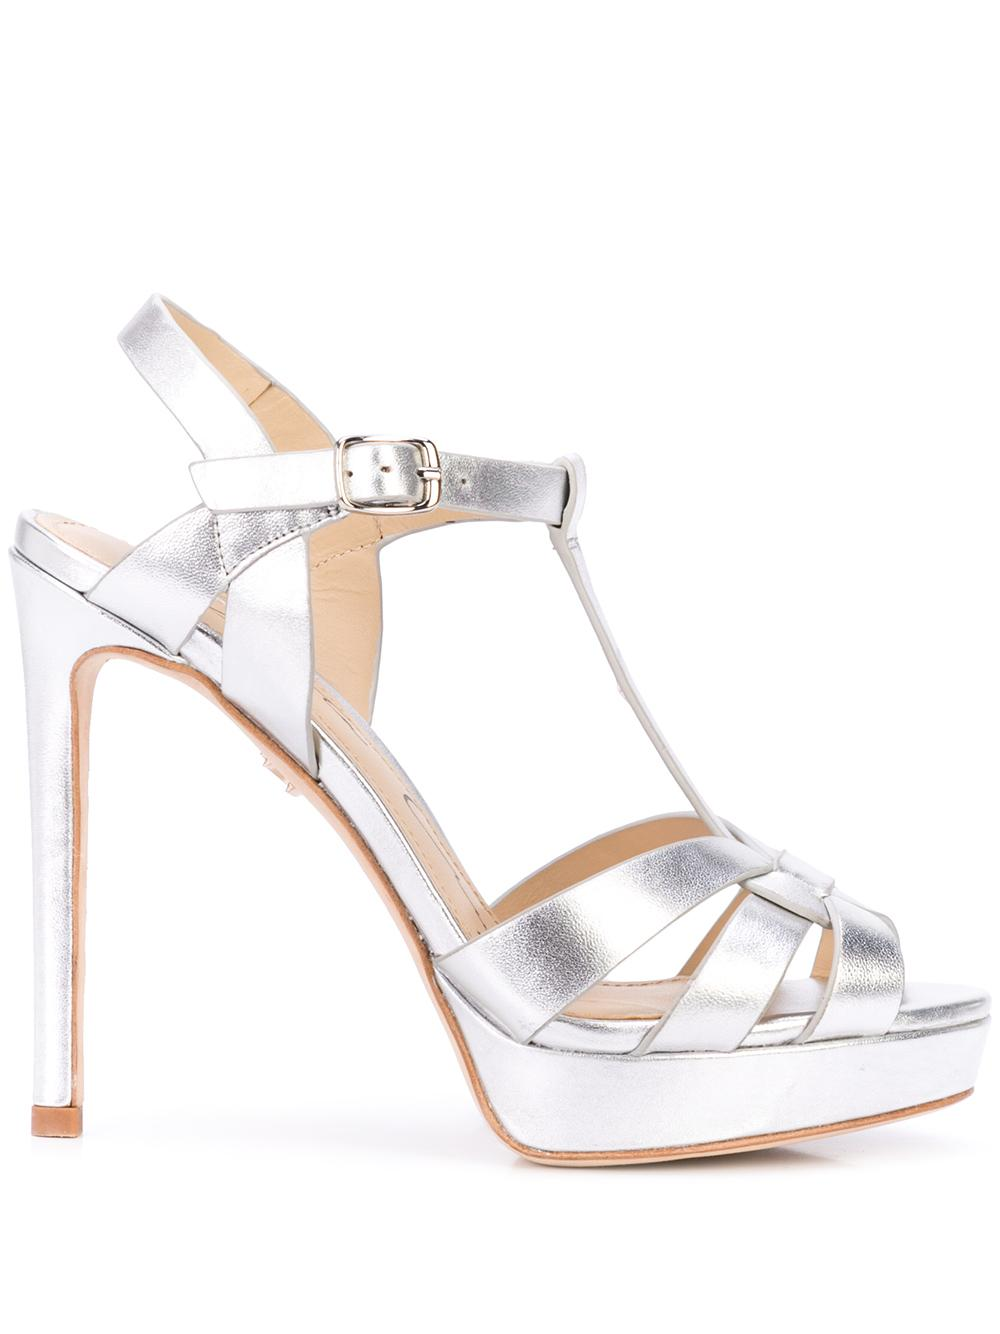 Gold Tone Platform Stiletto Sandal